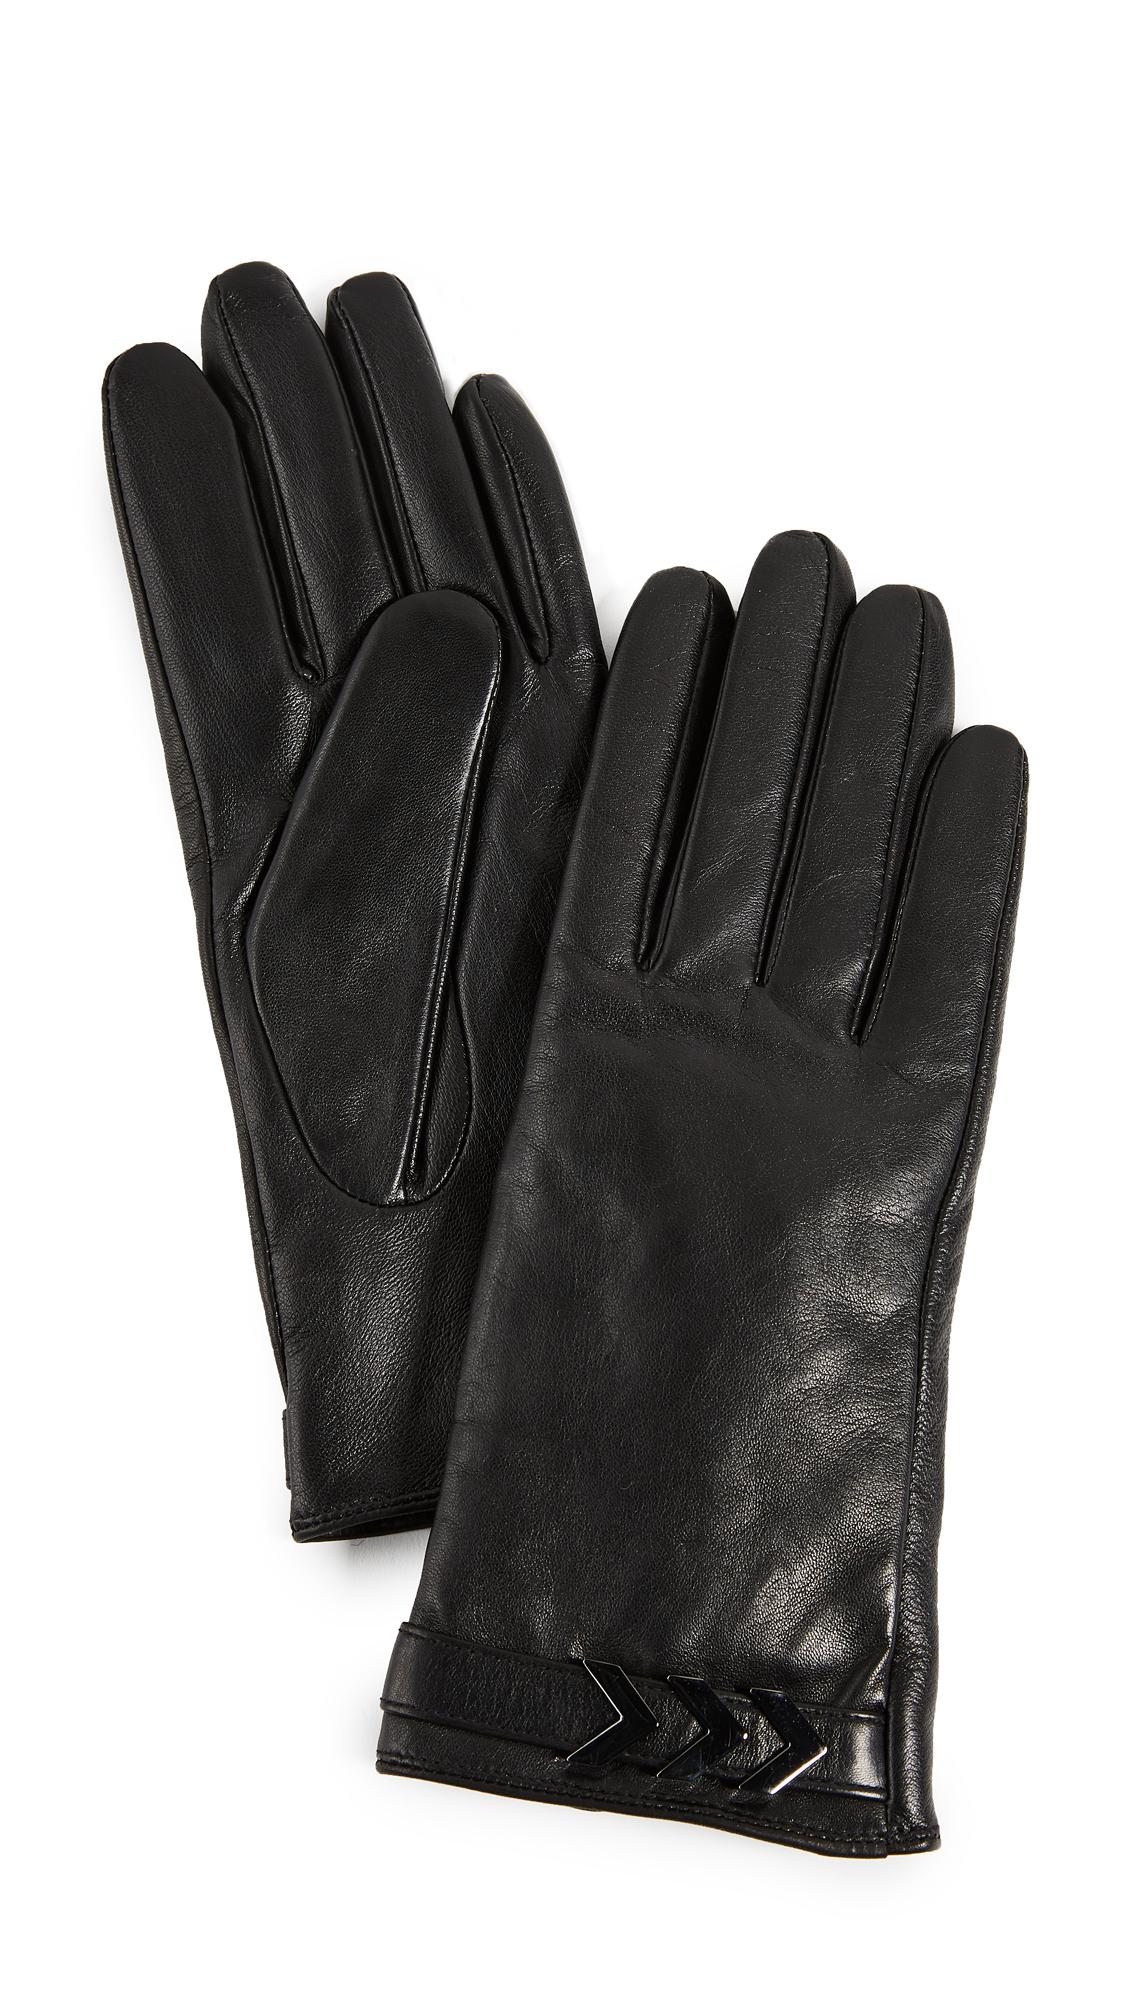 Mackage Boga Leather Tech Gloves - Black